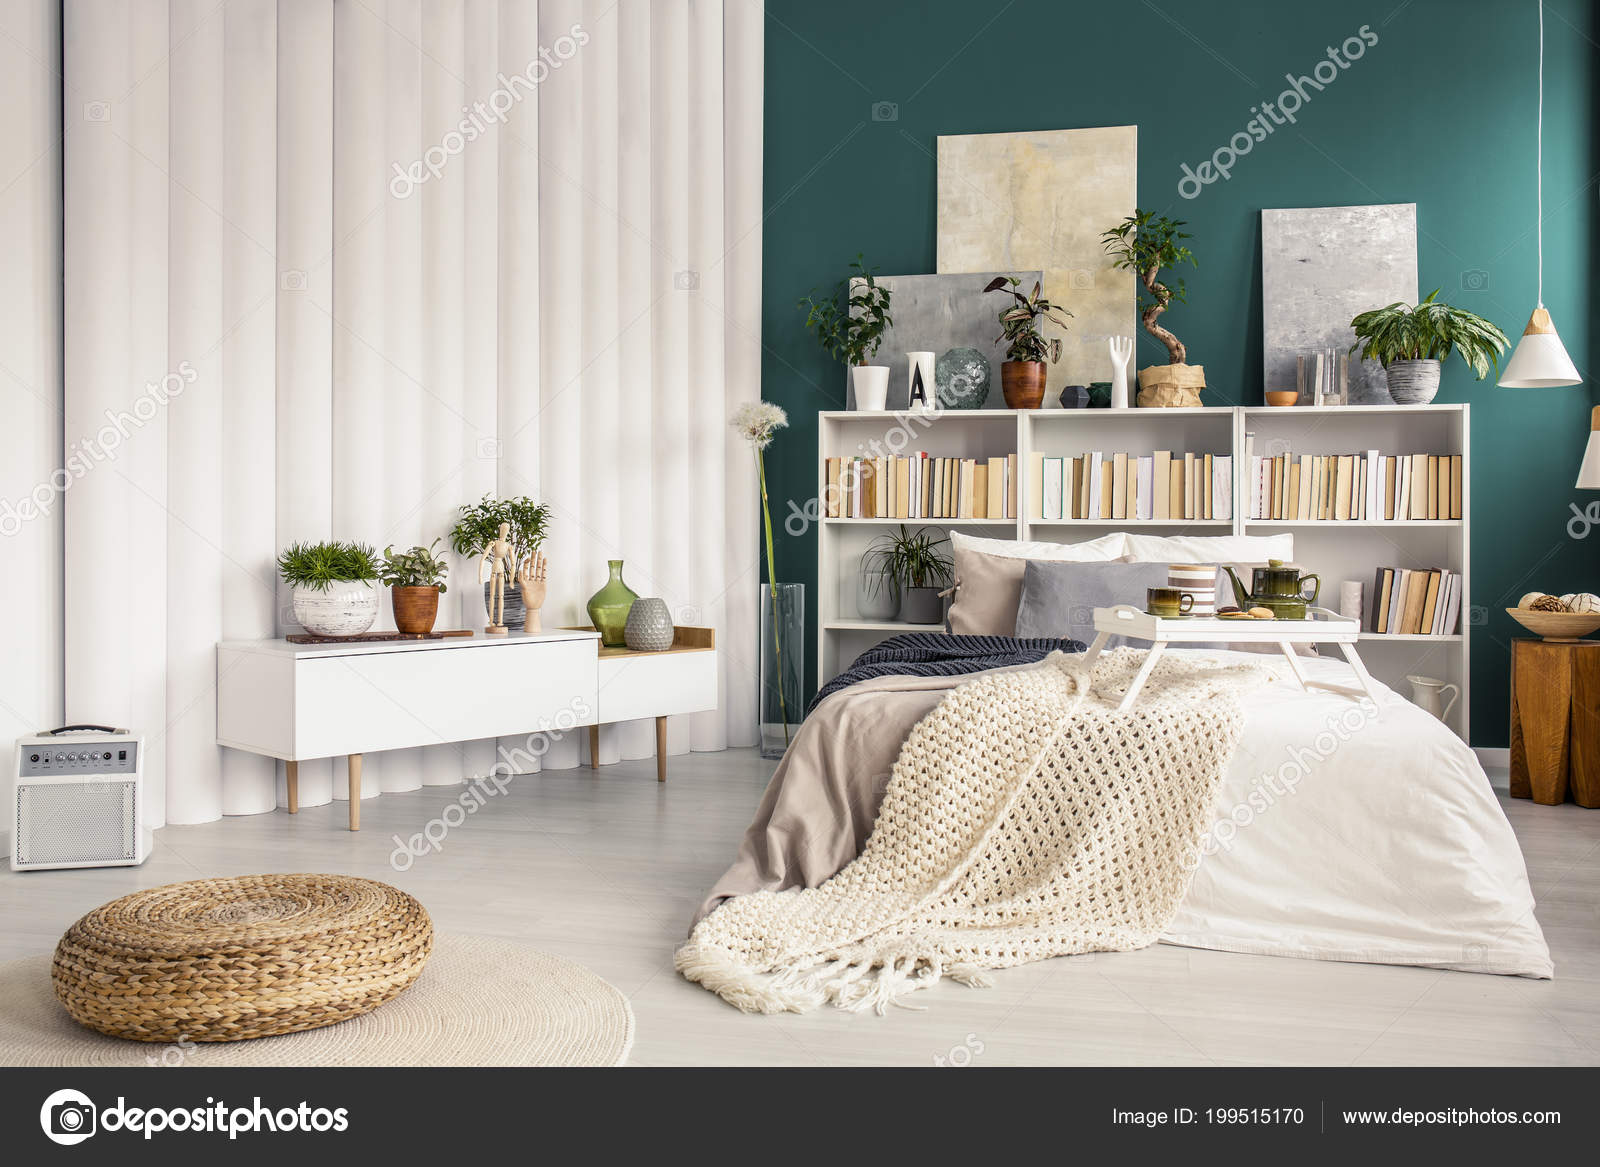 Witte Slaapkamer Meubels : Moderne slaapkamer interieur met turquoise groene muur potplanten